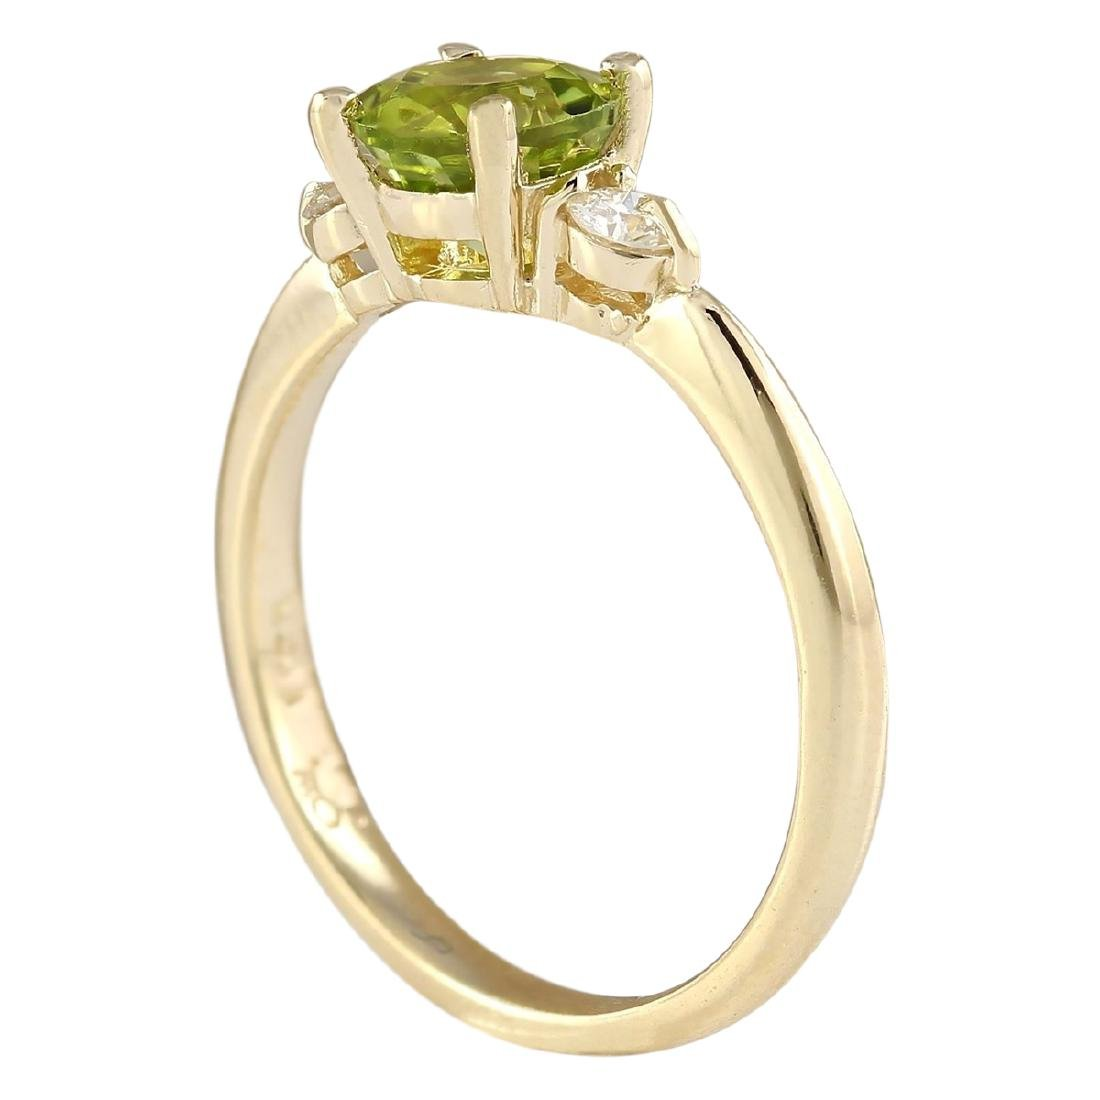 1.40 CTW Natural Peridot And Diamond Ring In 18K Yellow - 3